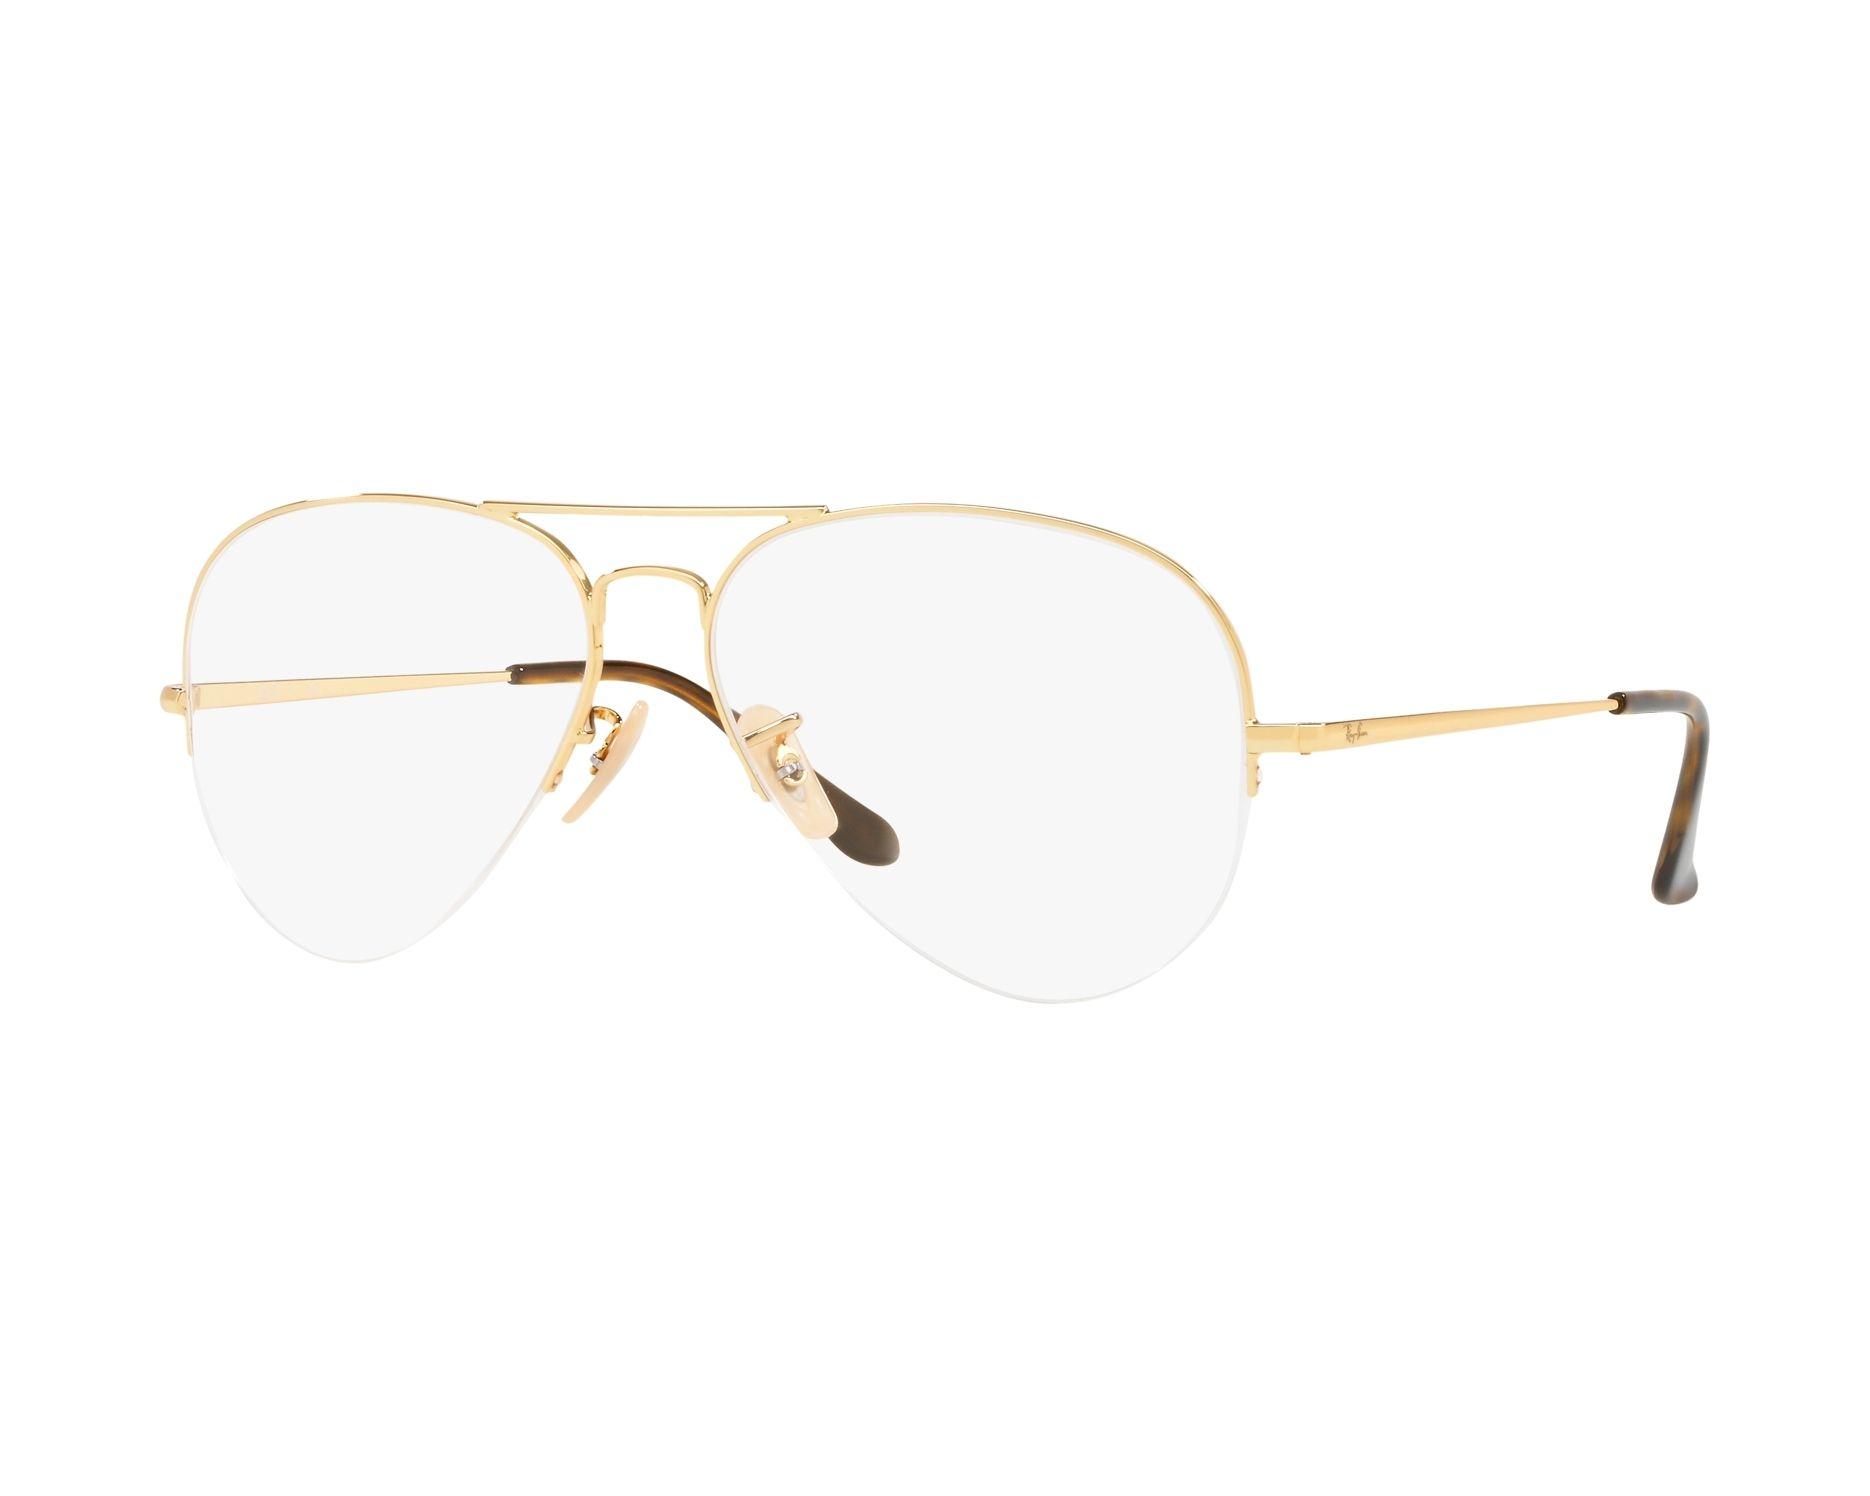 e03d2c0e59269 eyeglasses Ray-Ban RX-6589 2500 56-15 Gold